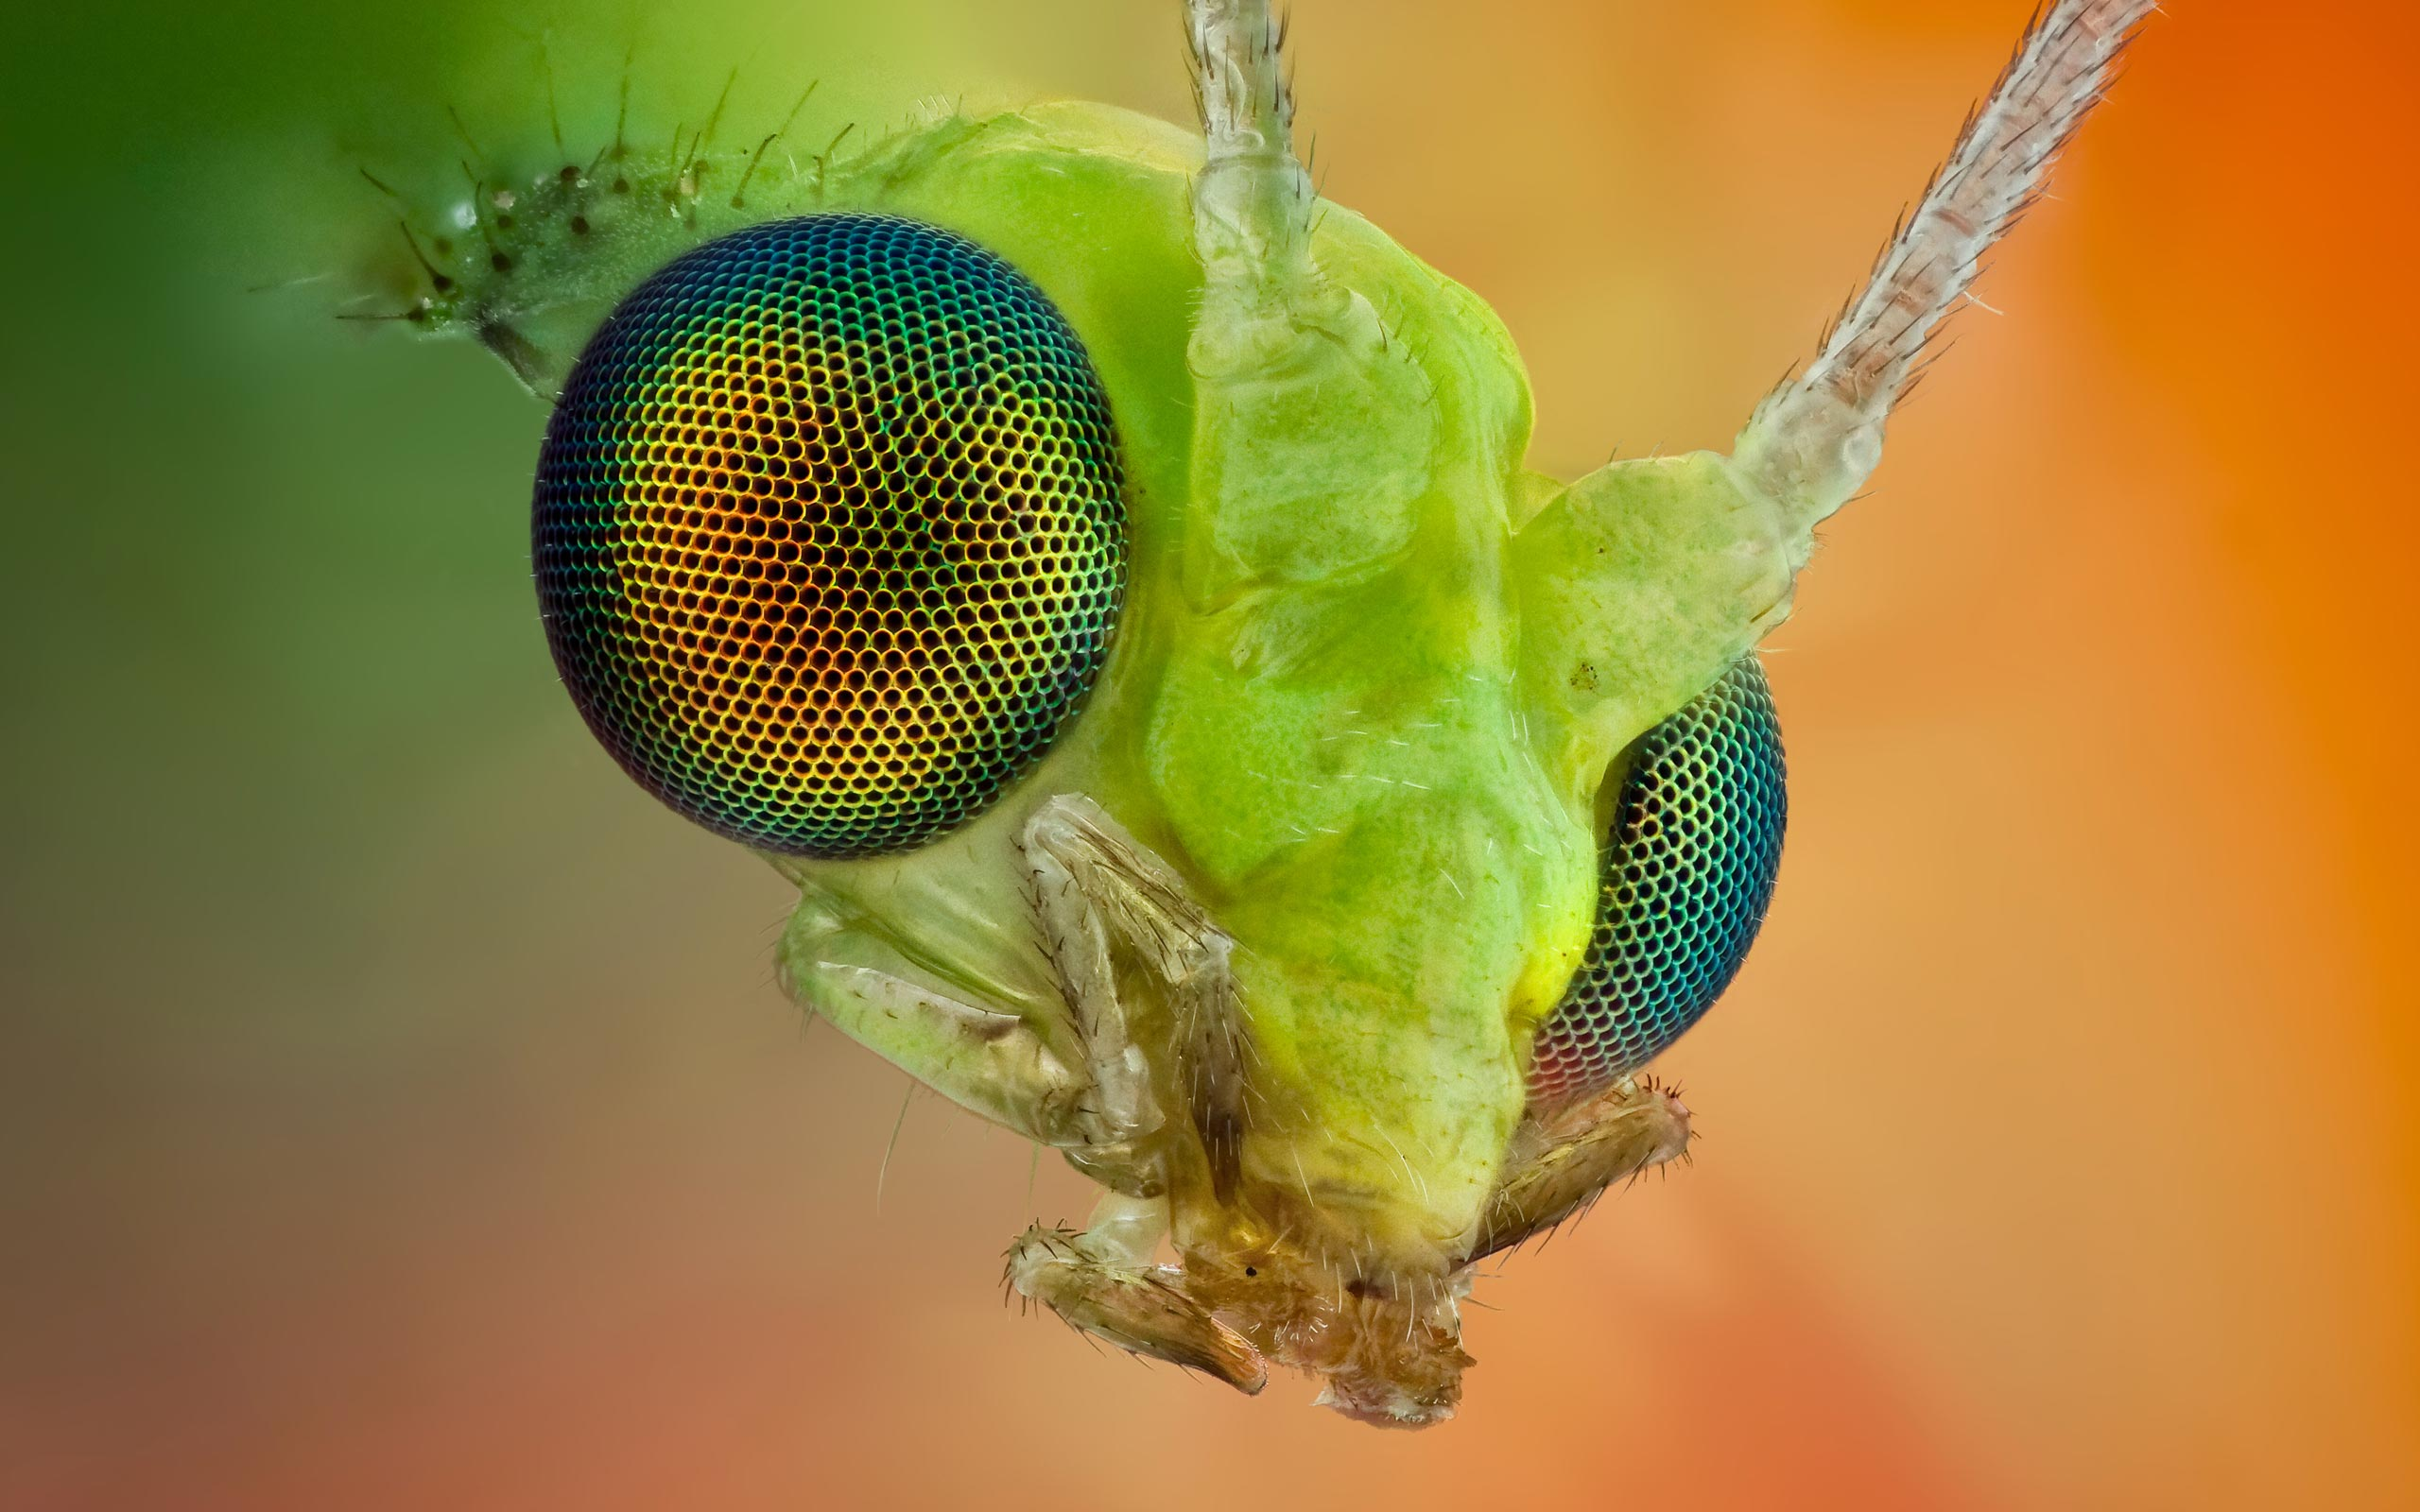 Insect Macro Wallpaper High Resolution Jpeg 8924